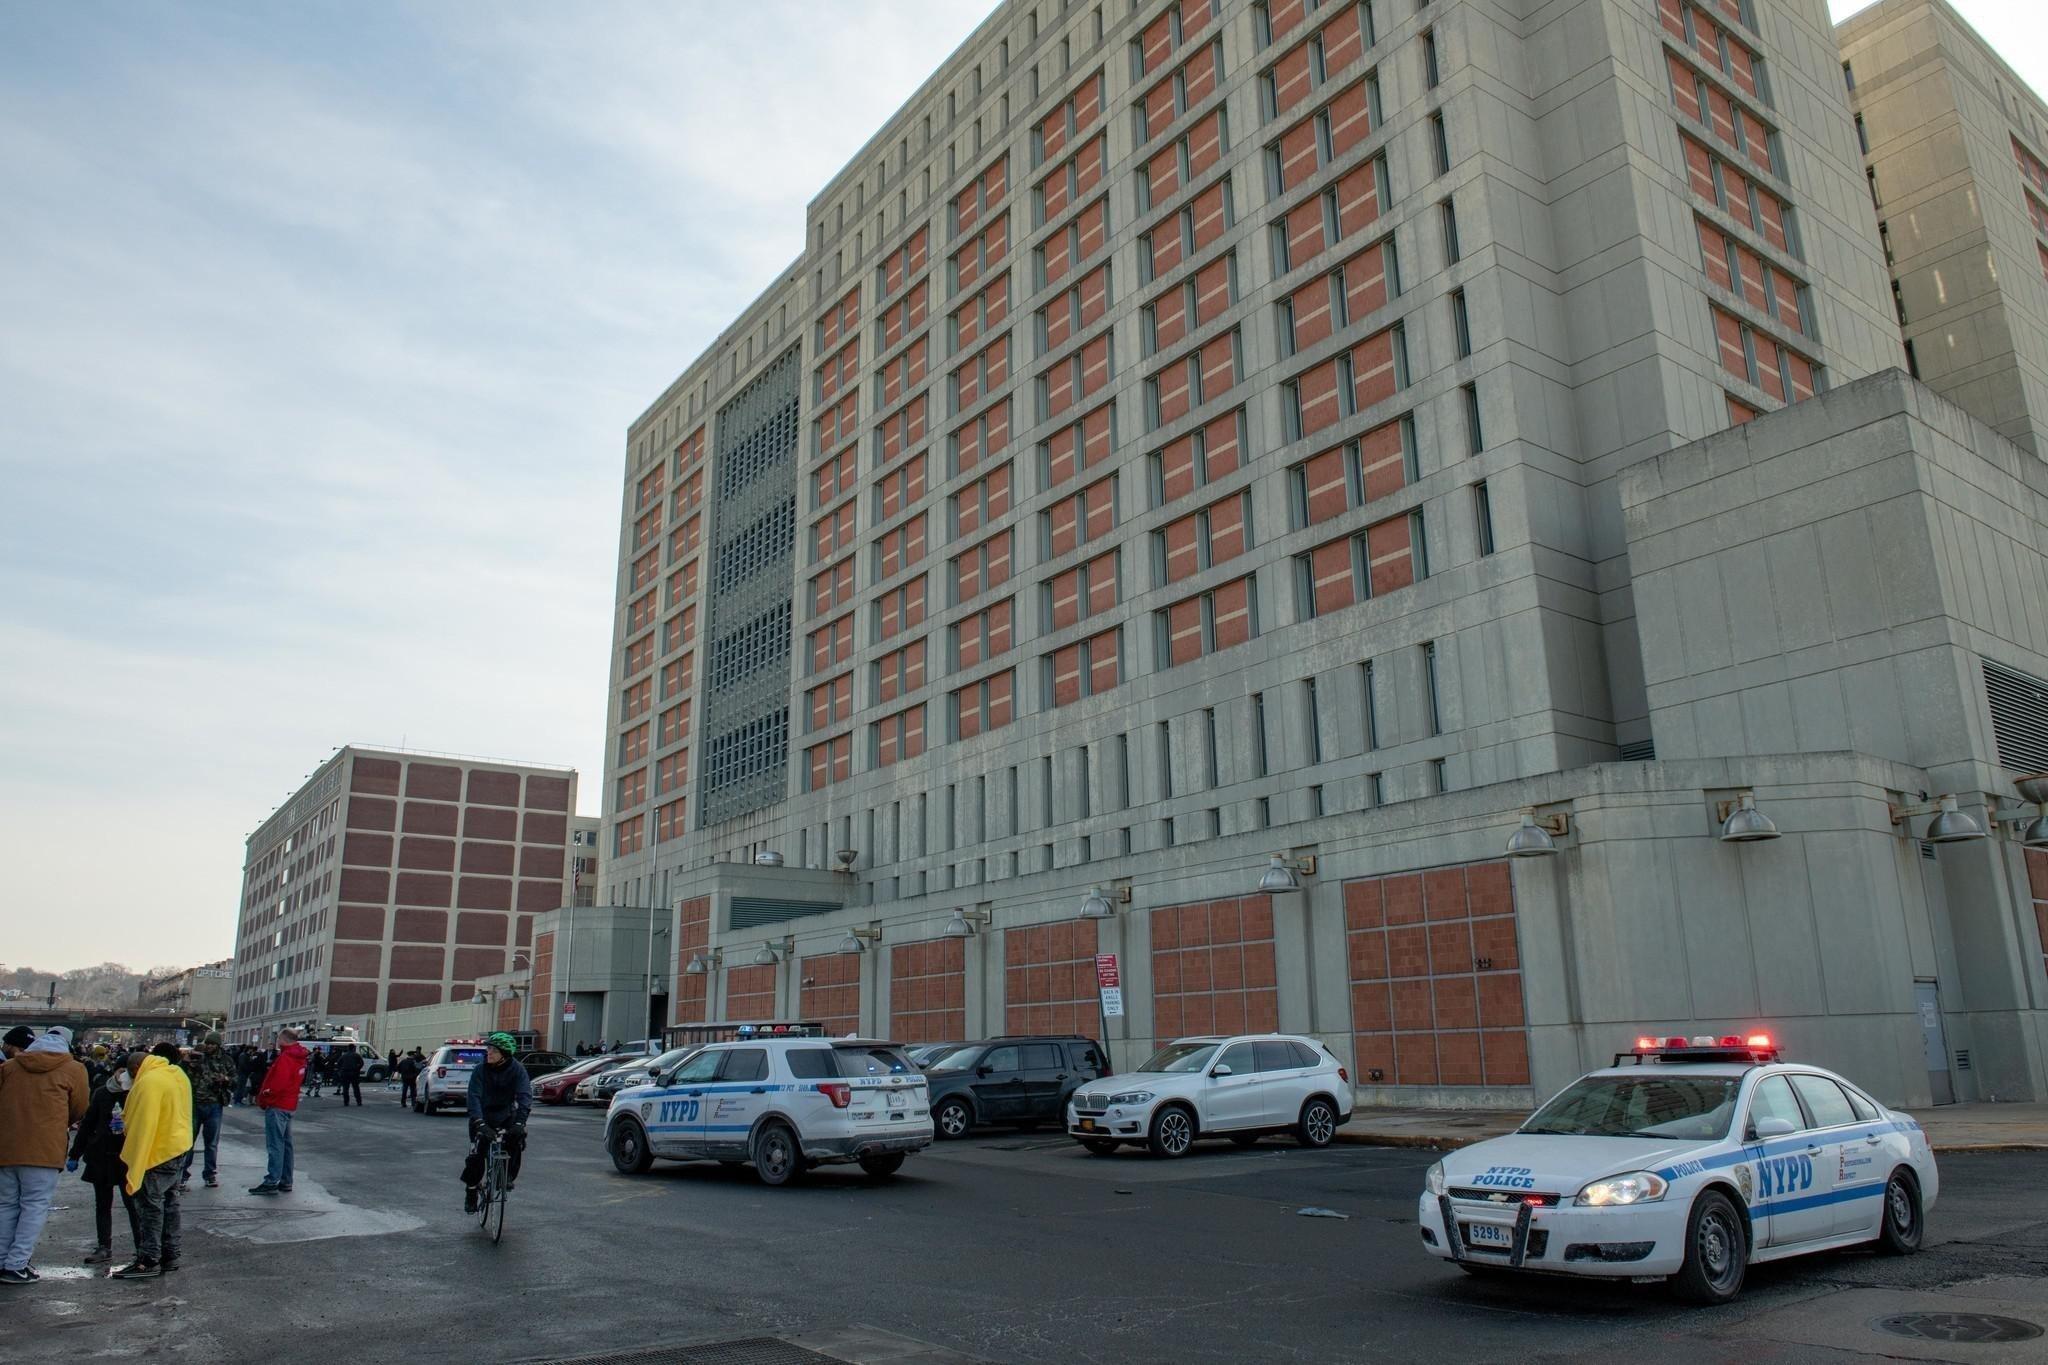 Feds must report coronavirus numbers in city's jails, Brooklyn judge orders